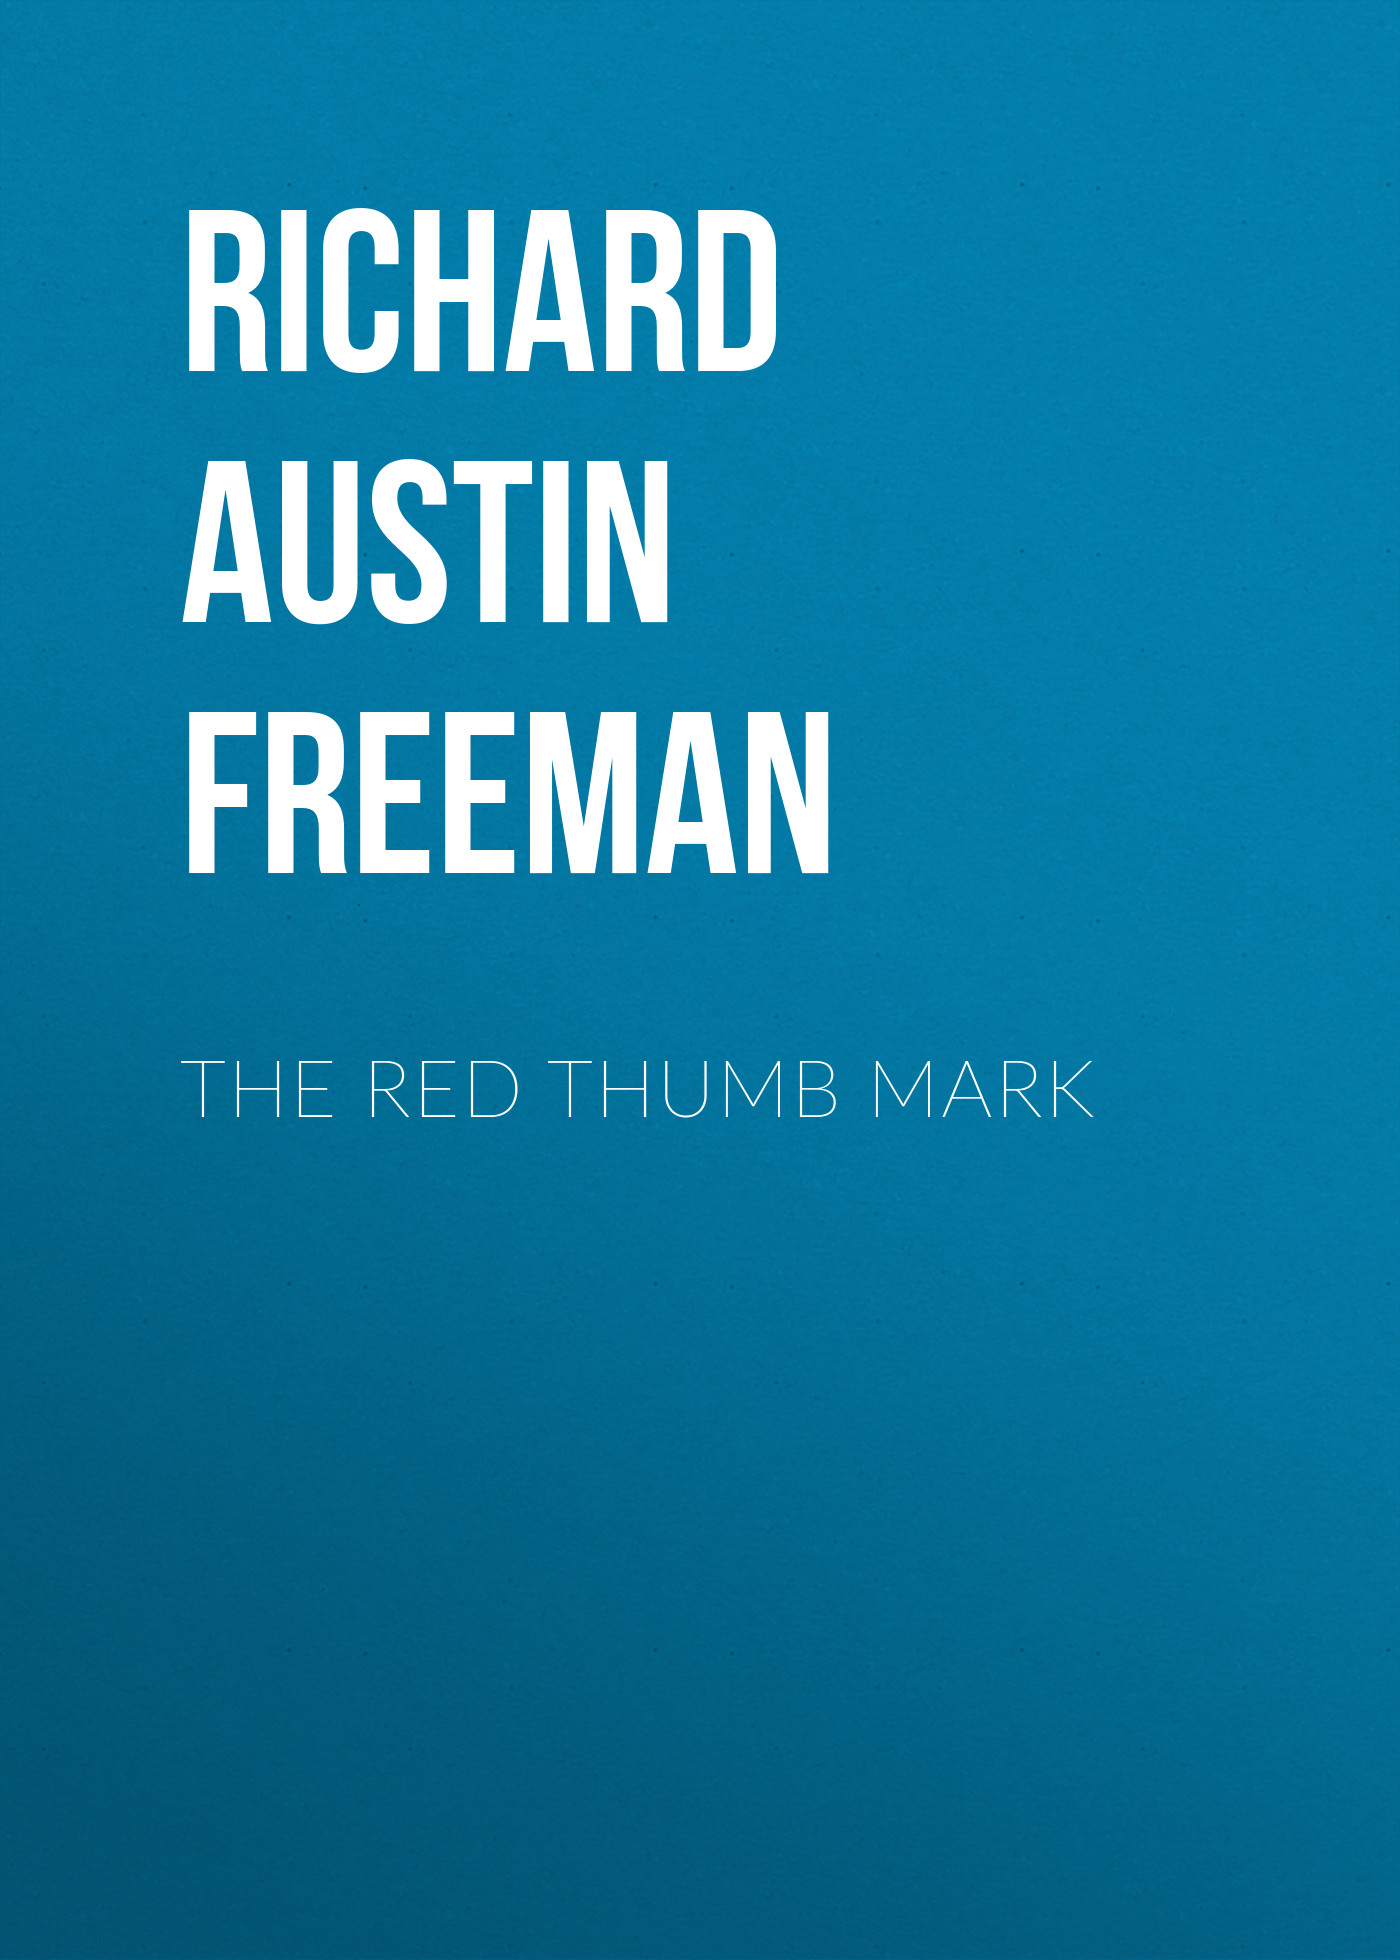 Richard Austin Freeman The Red Thumb Mark r austin freeman punane pöidlajälg